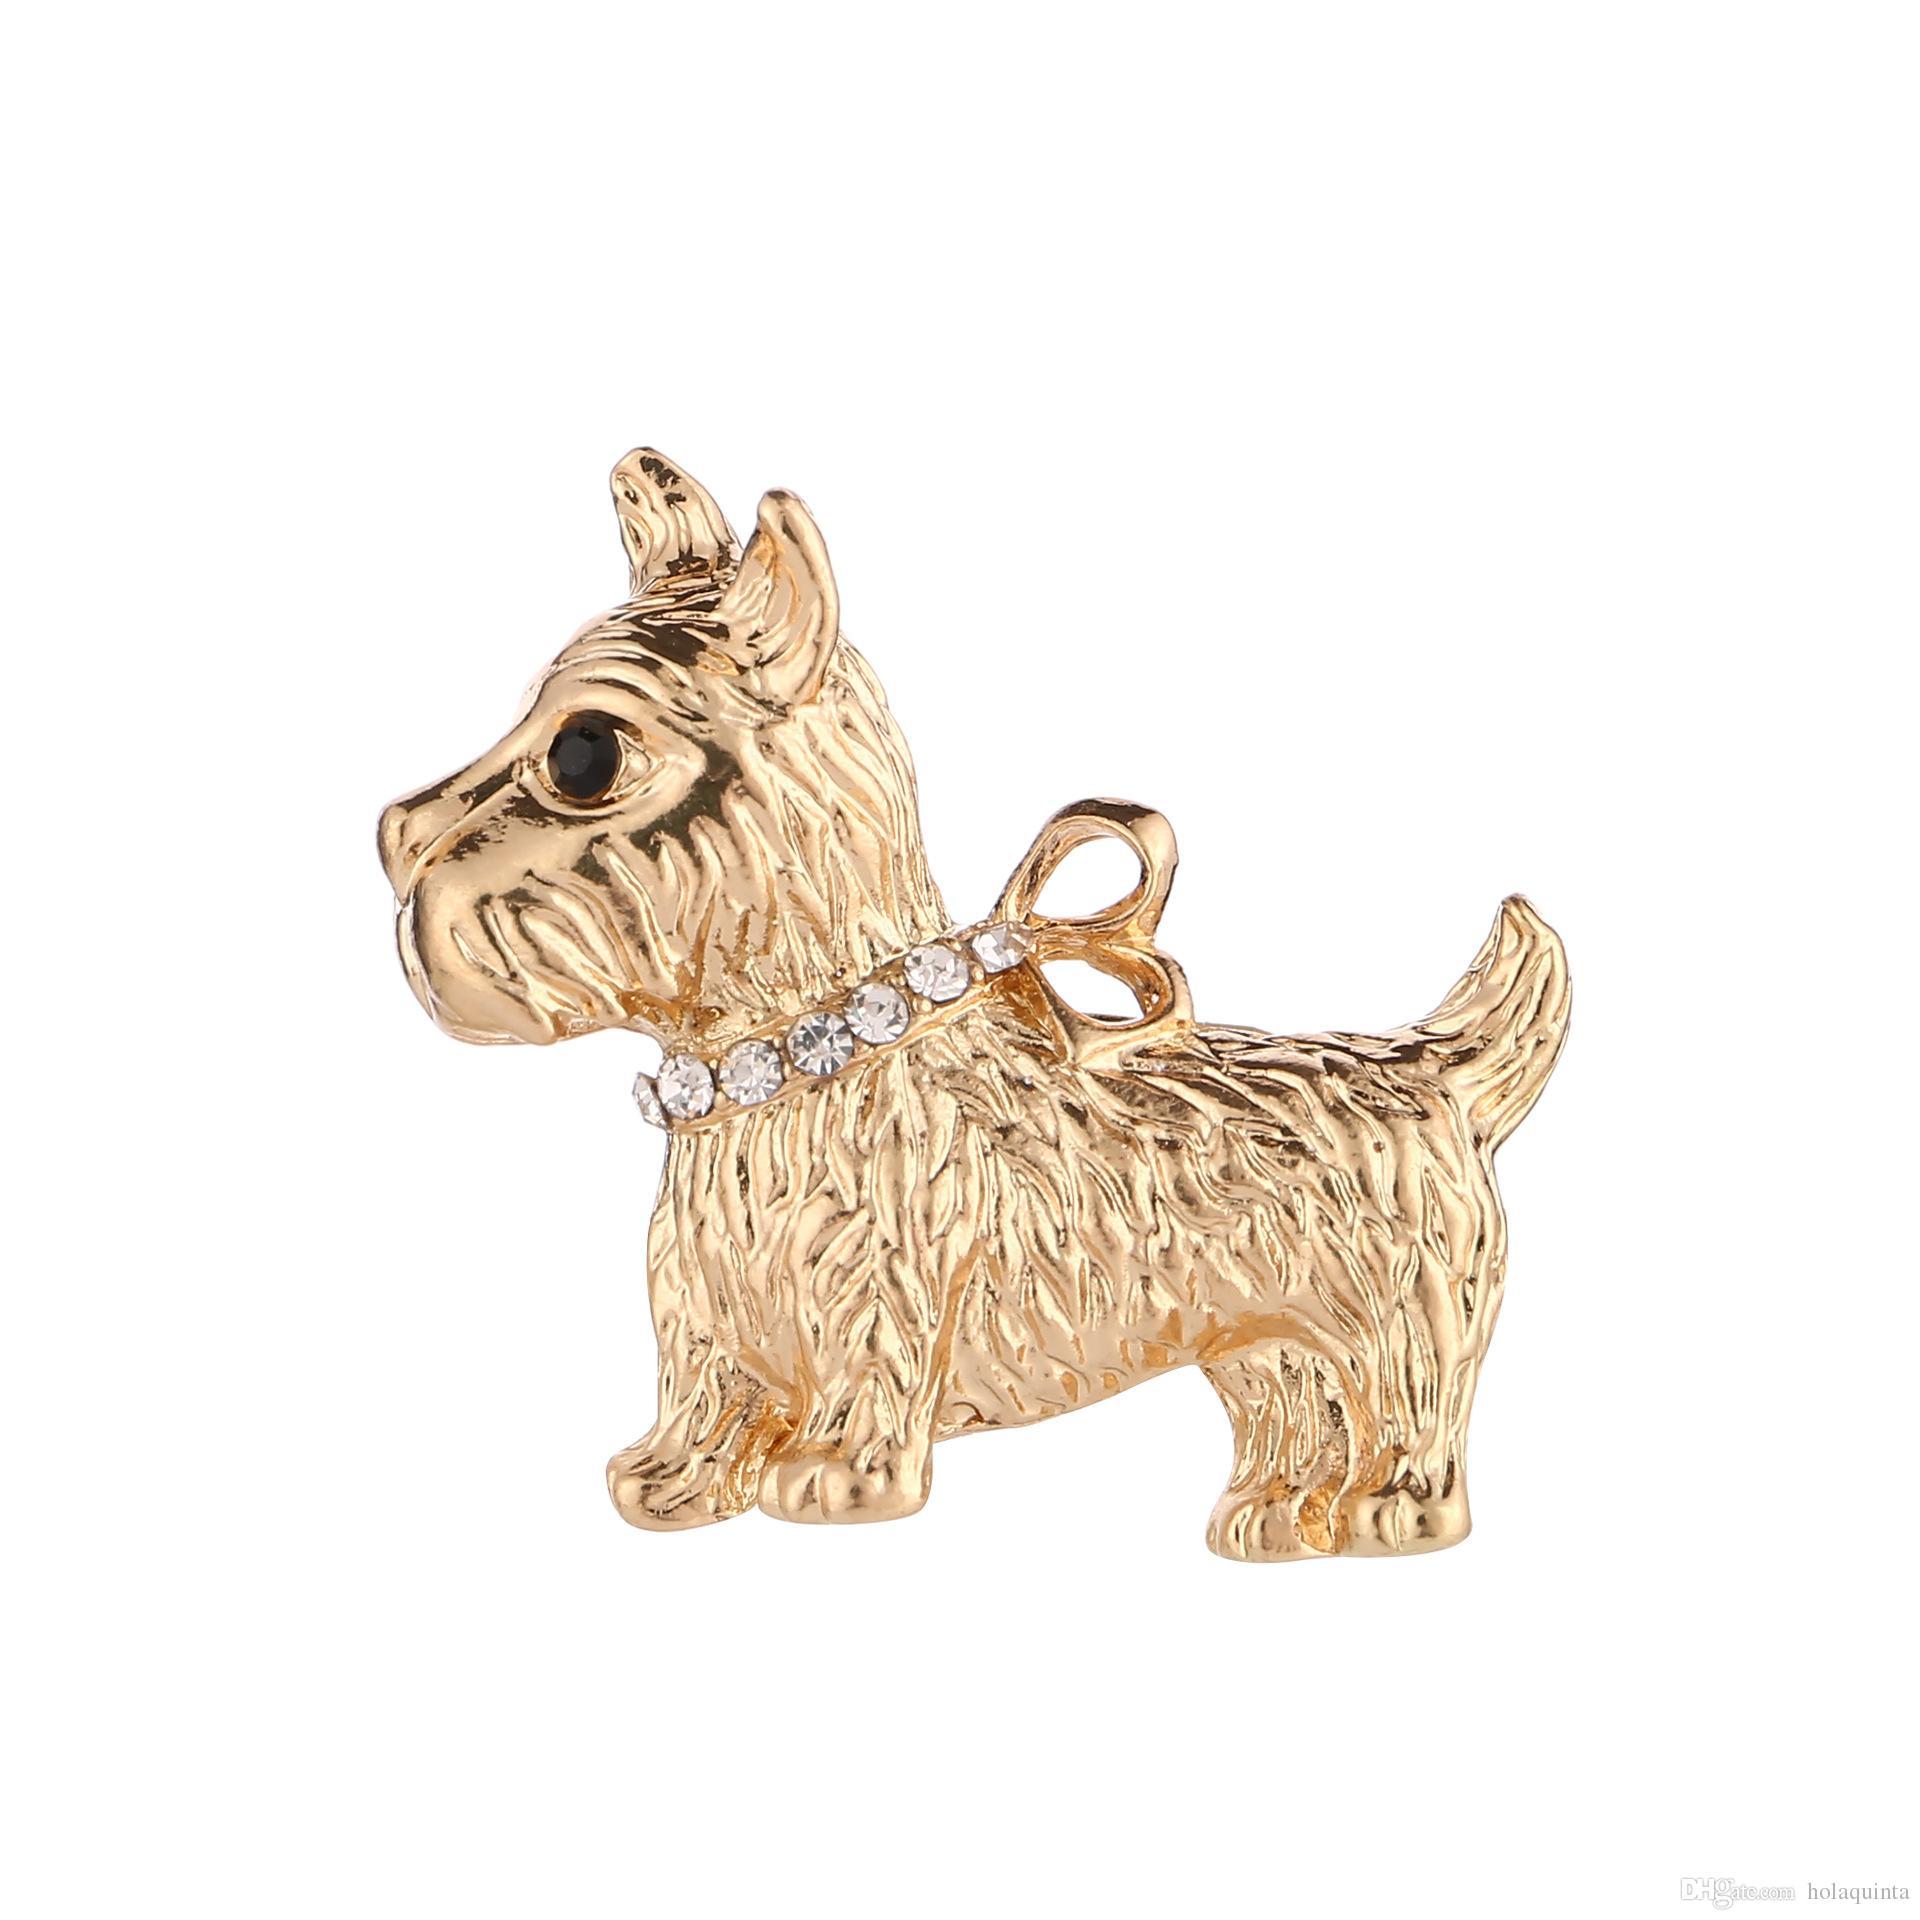 Moda Jóias Charme Ouro Dog Puppy Broche Novo Design Animal Bonito Jaqueta Acessórios Ornamentos